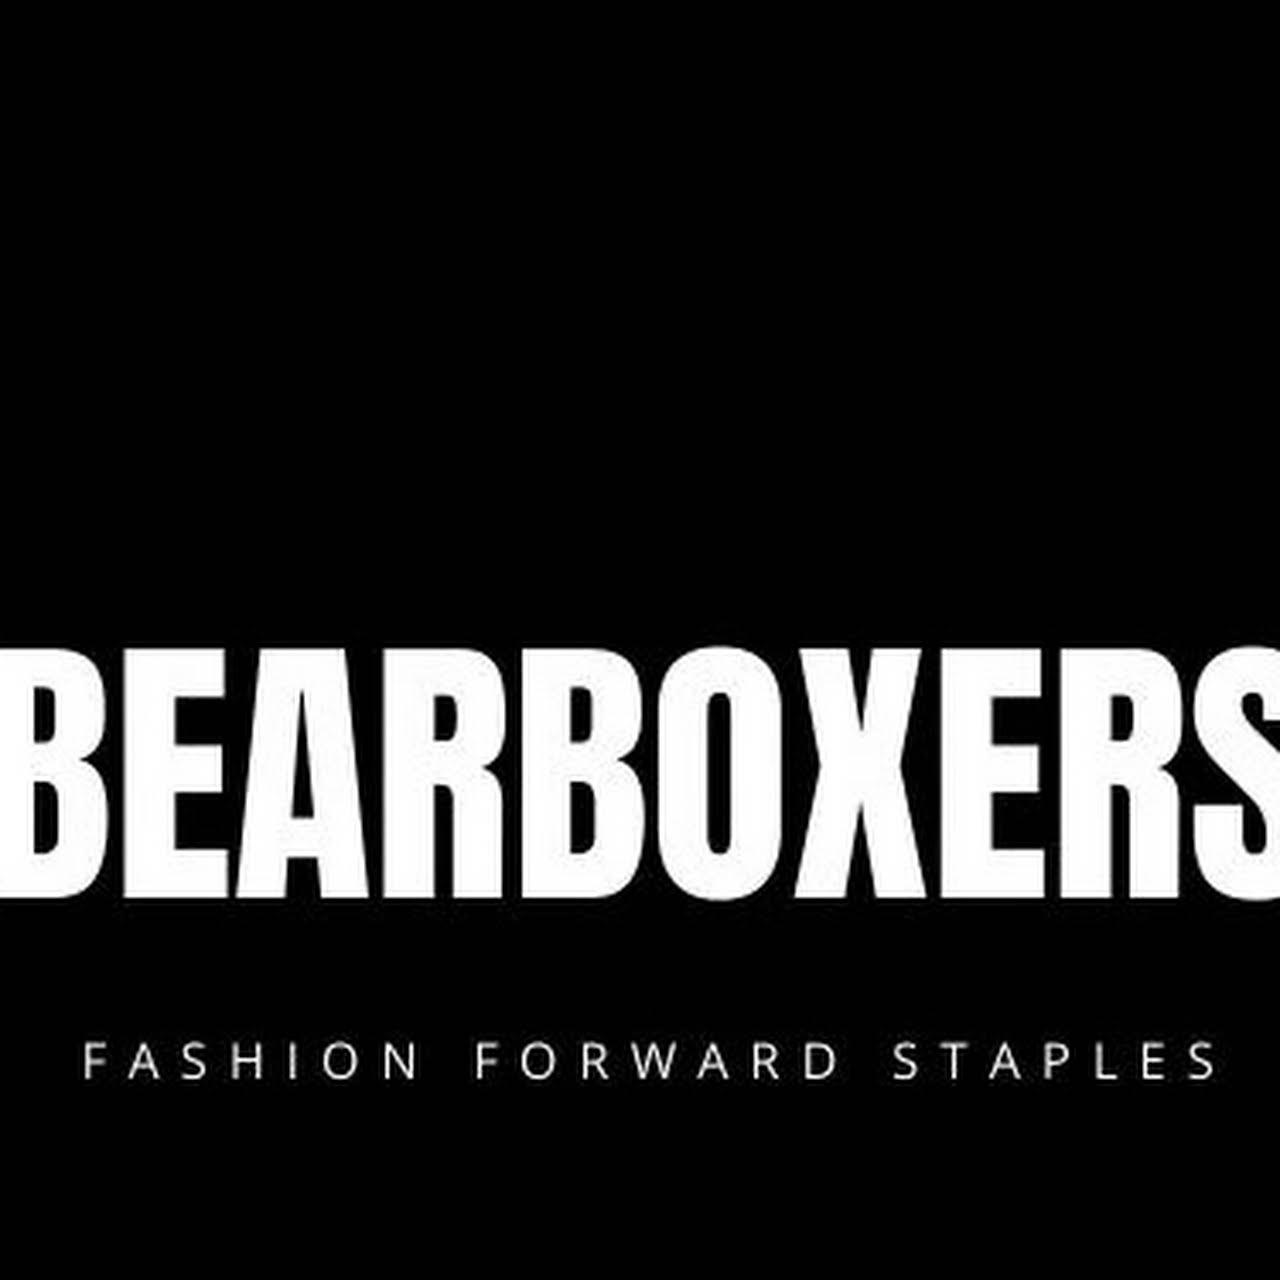 Bearboxers Menswear